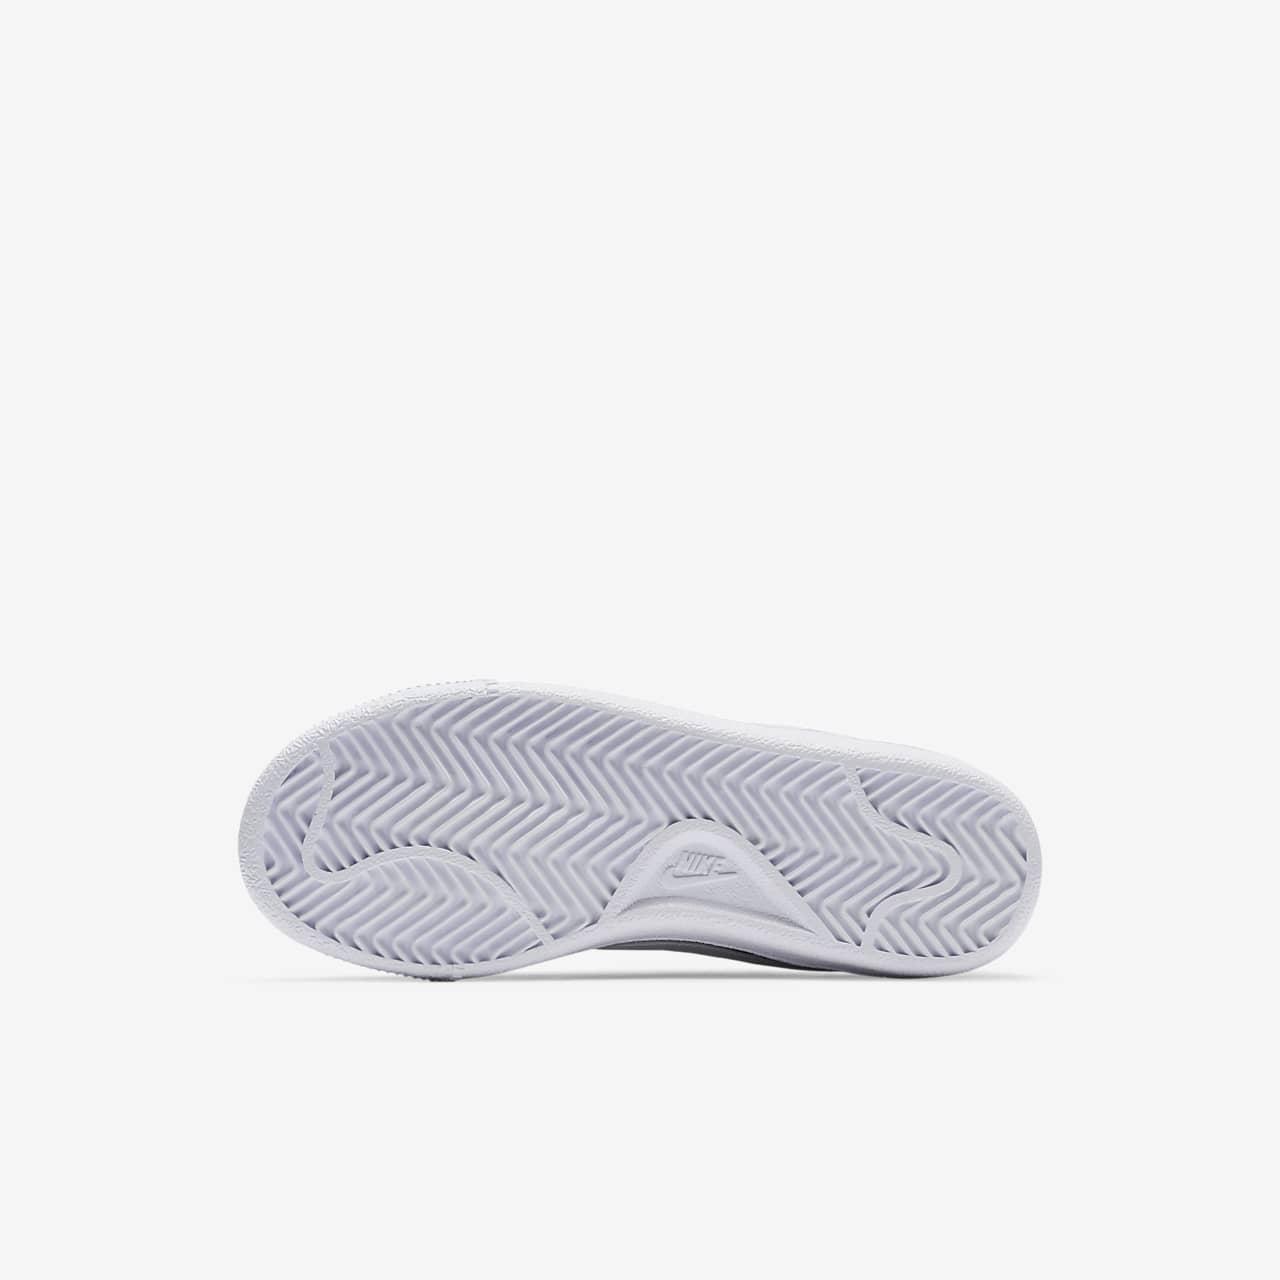 4ab7b633dbb1 NikeCourt Royale Little Kids  Shoe. Nike.com